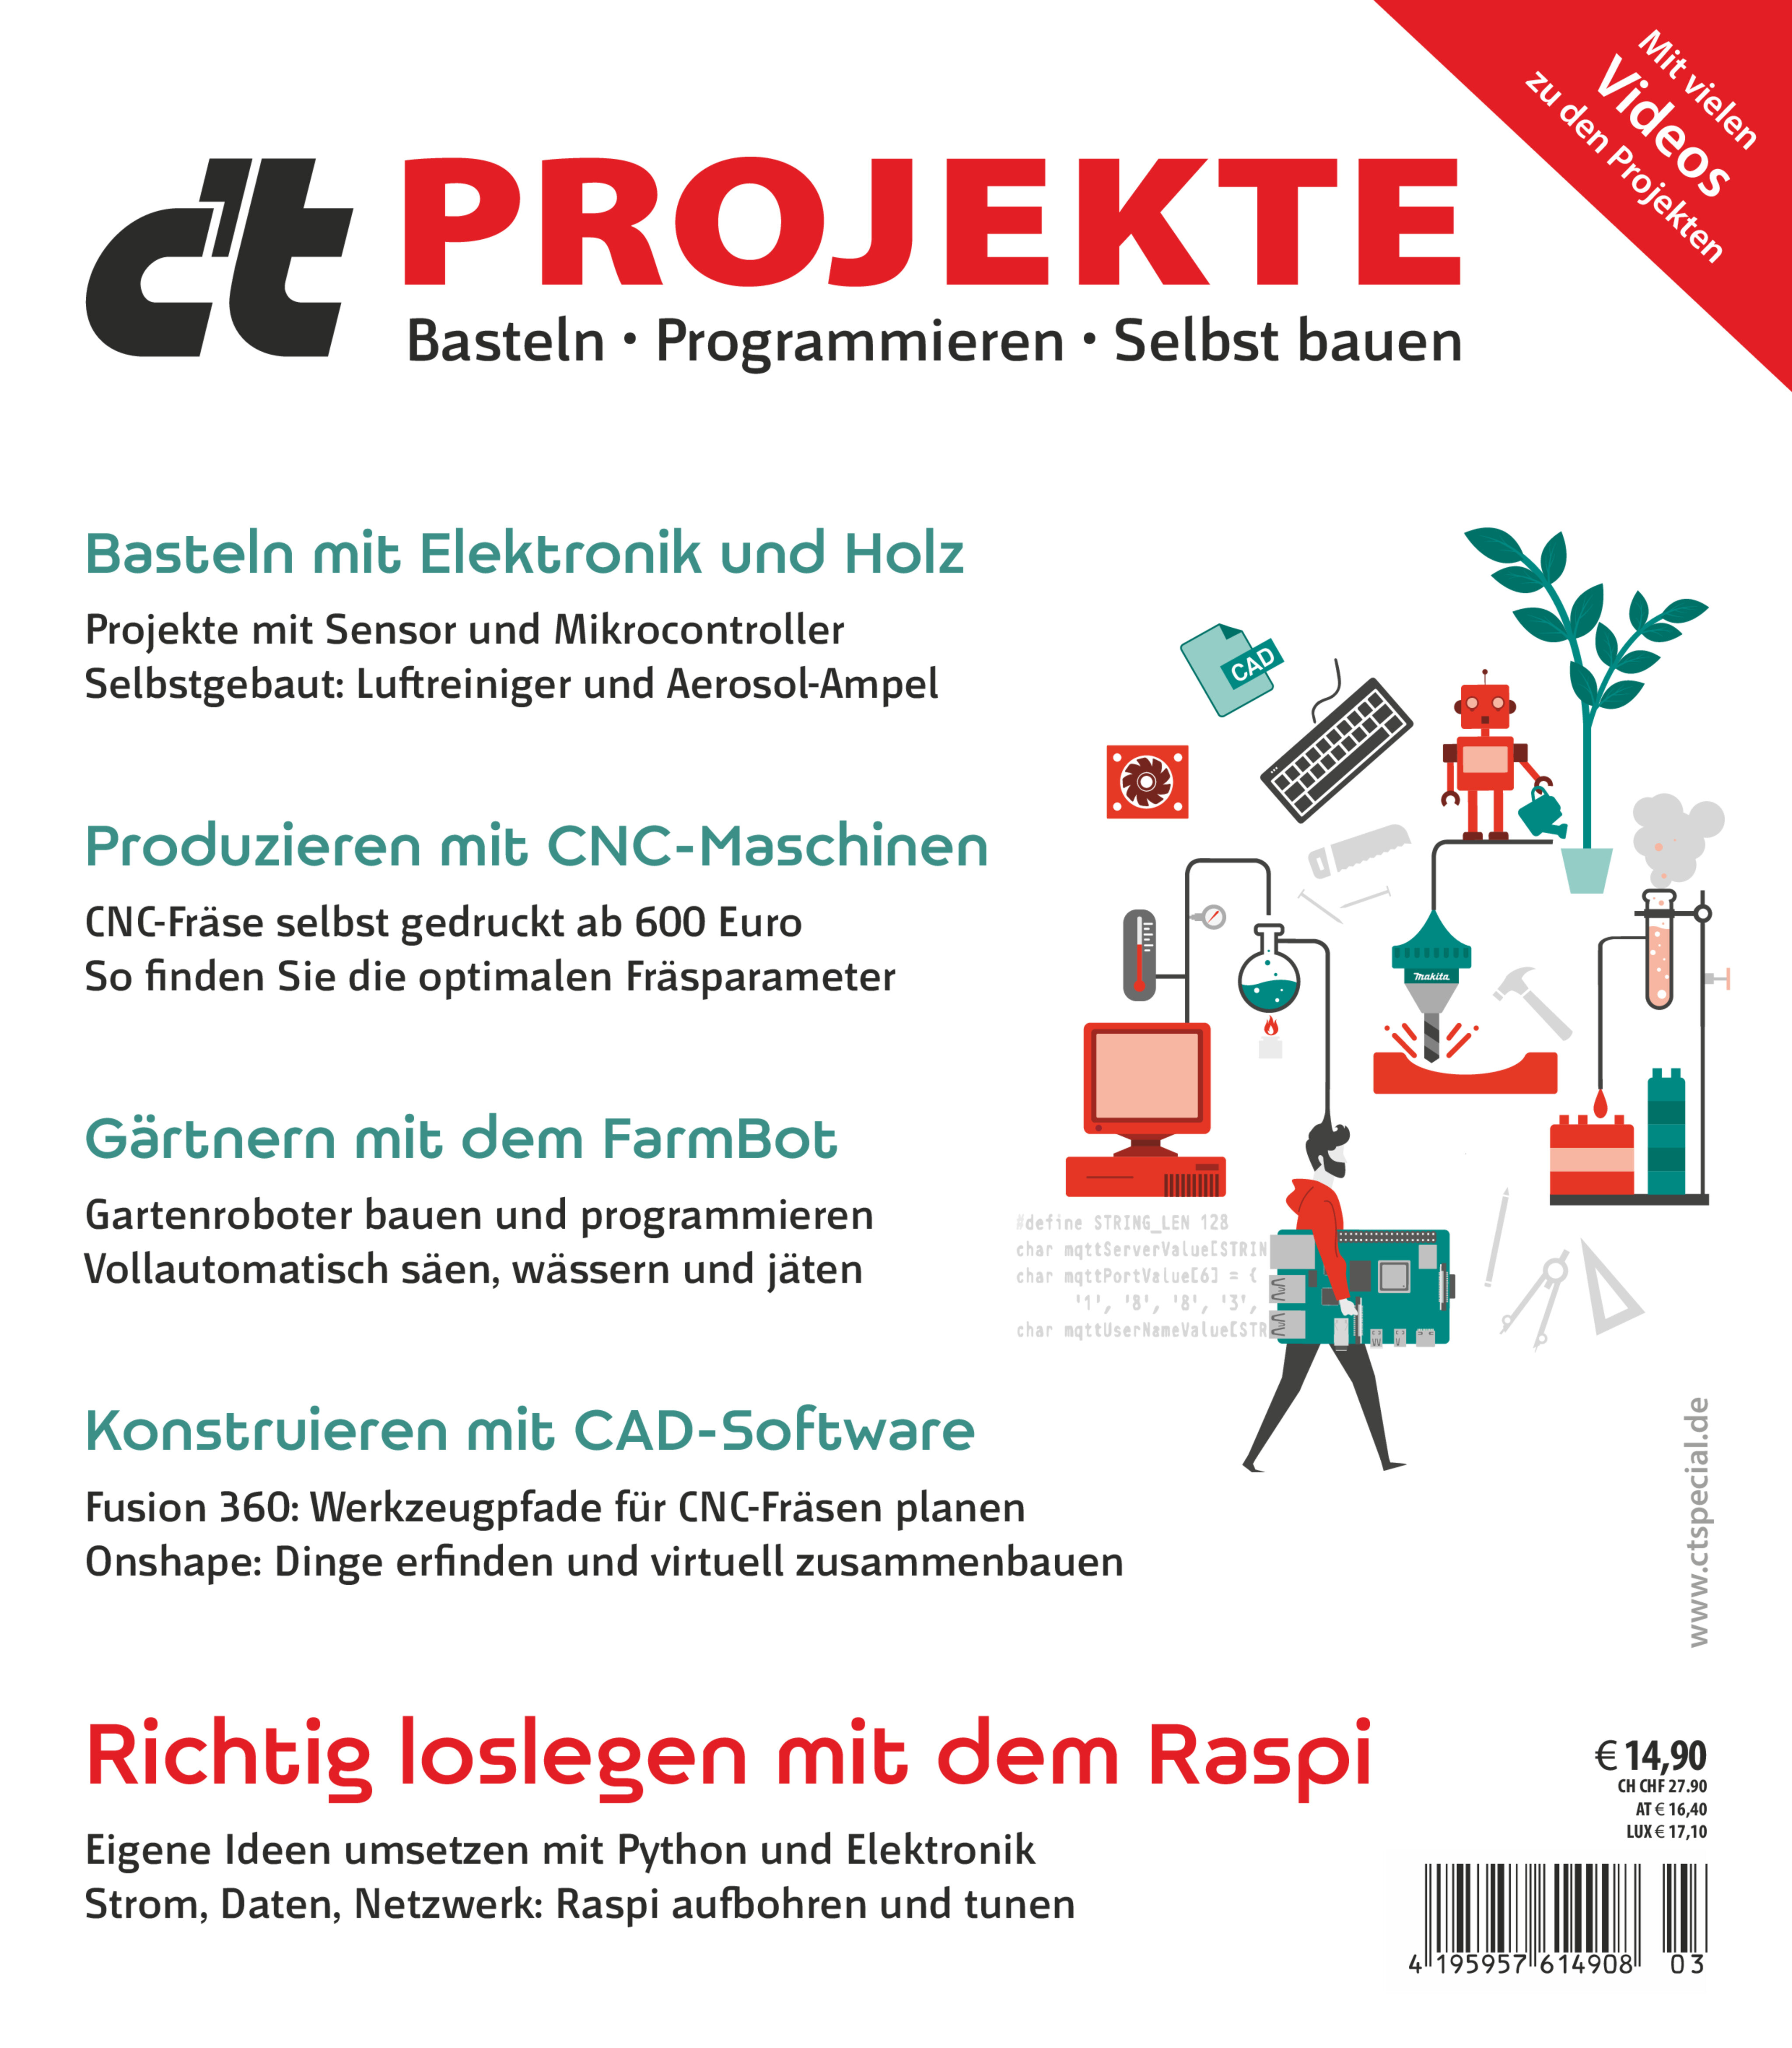 c't Projekte 2021